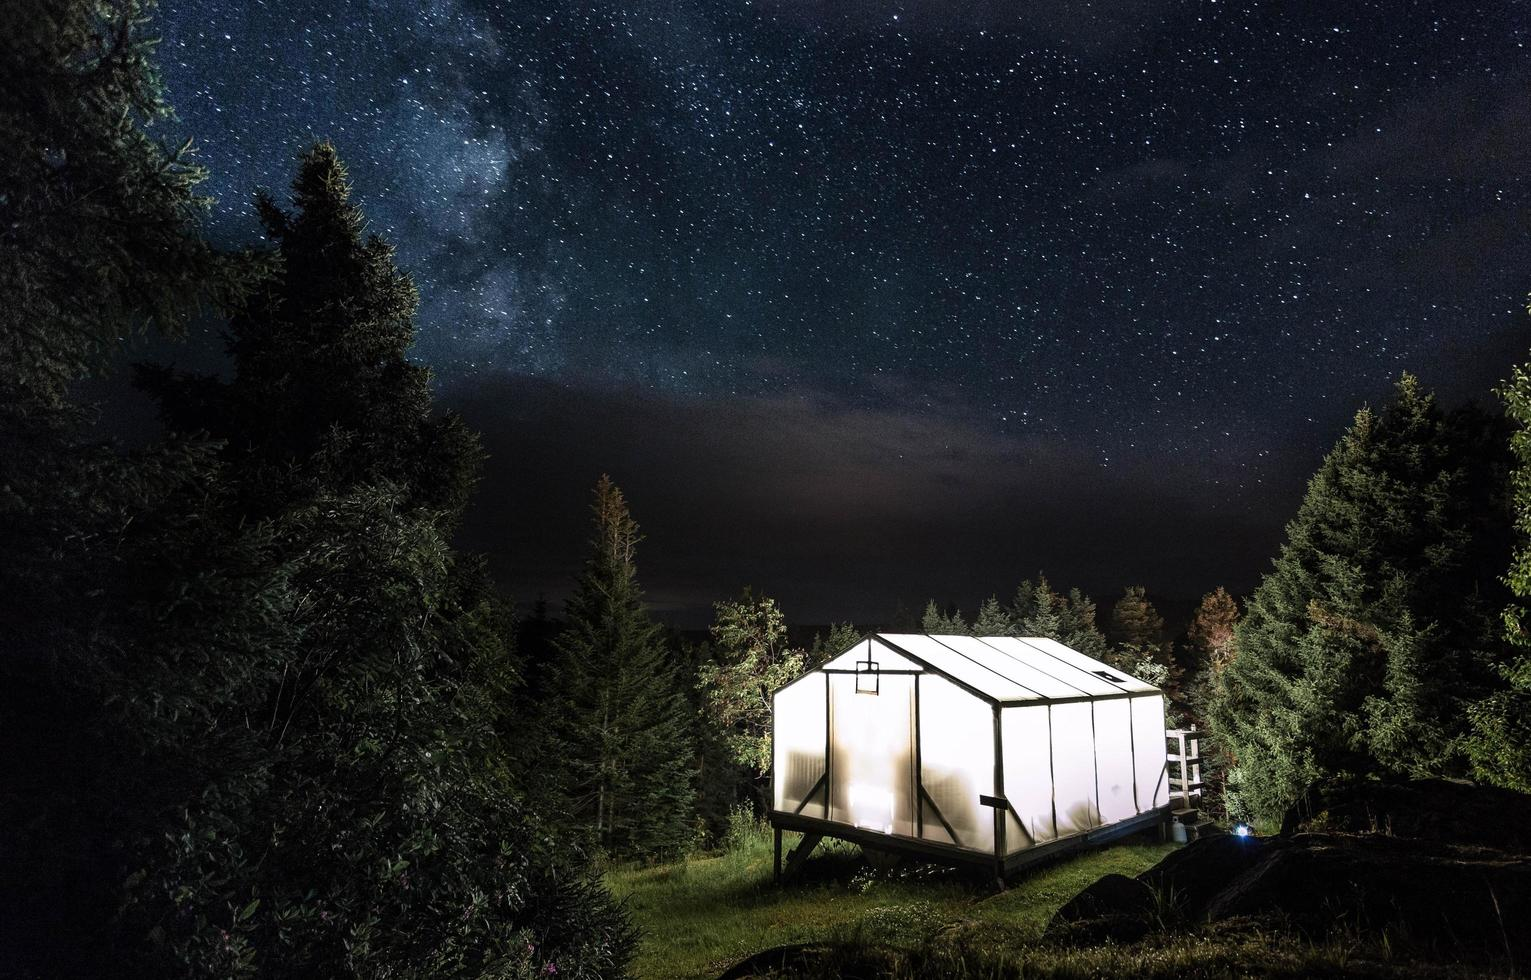 Illuminated camp shelter under starry sky photo